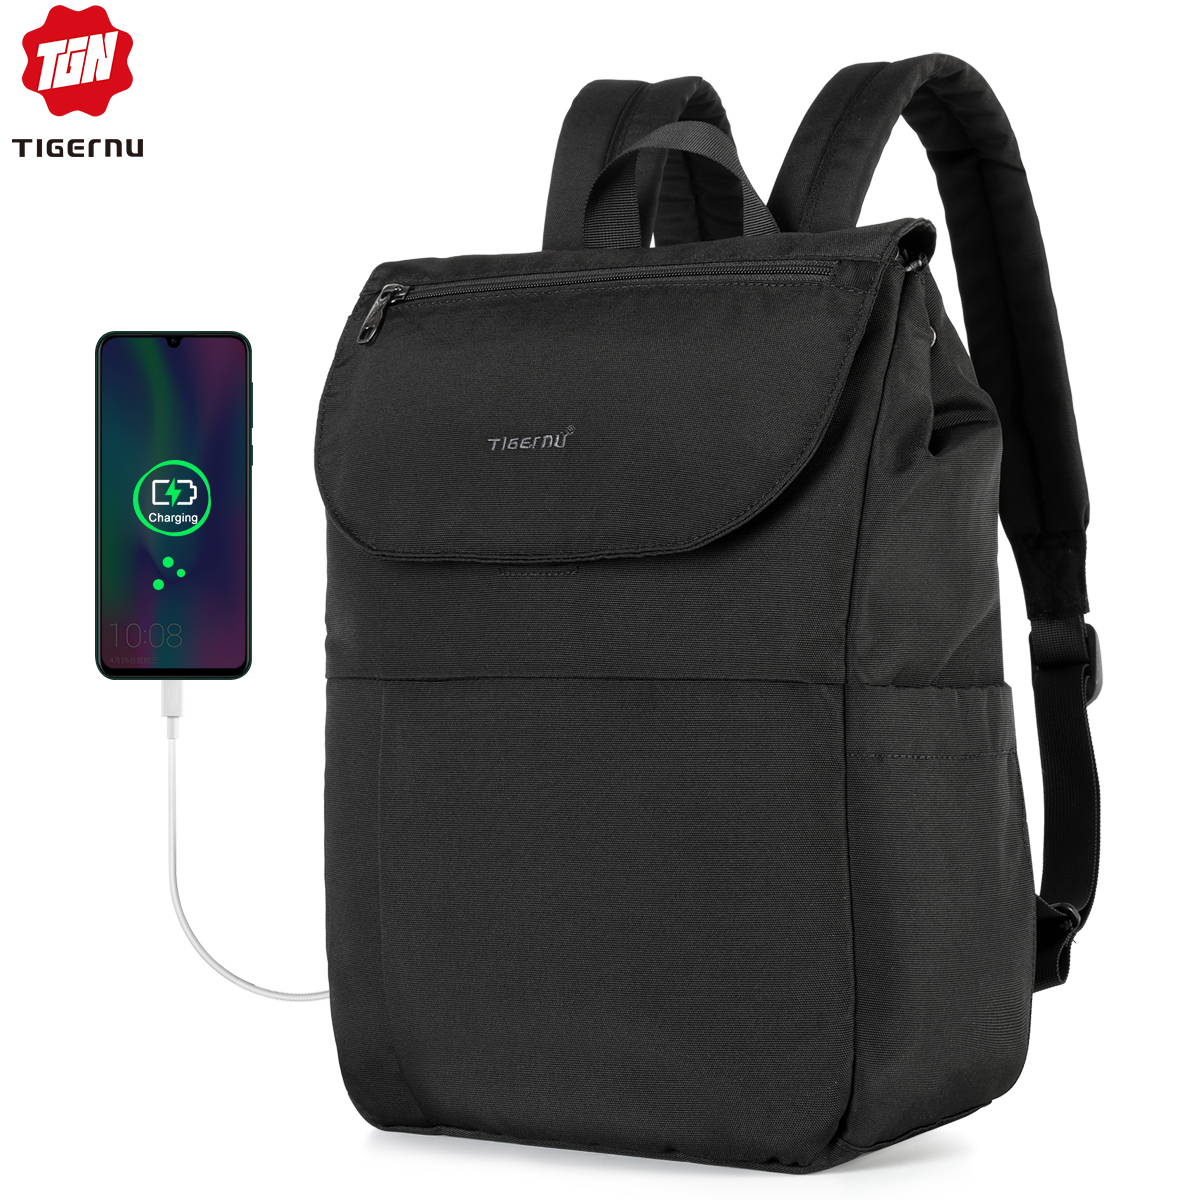 2020 Tigernu Fashion New Arrival Antifouling Waterproof RFID Anti Theft Backpacks Men Women Large Capacity School Backpack Male